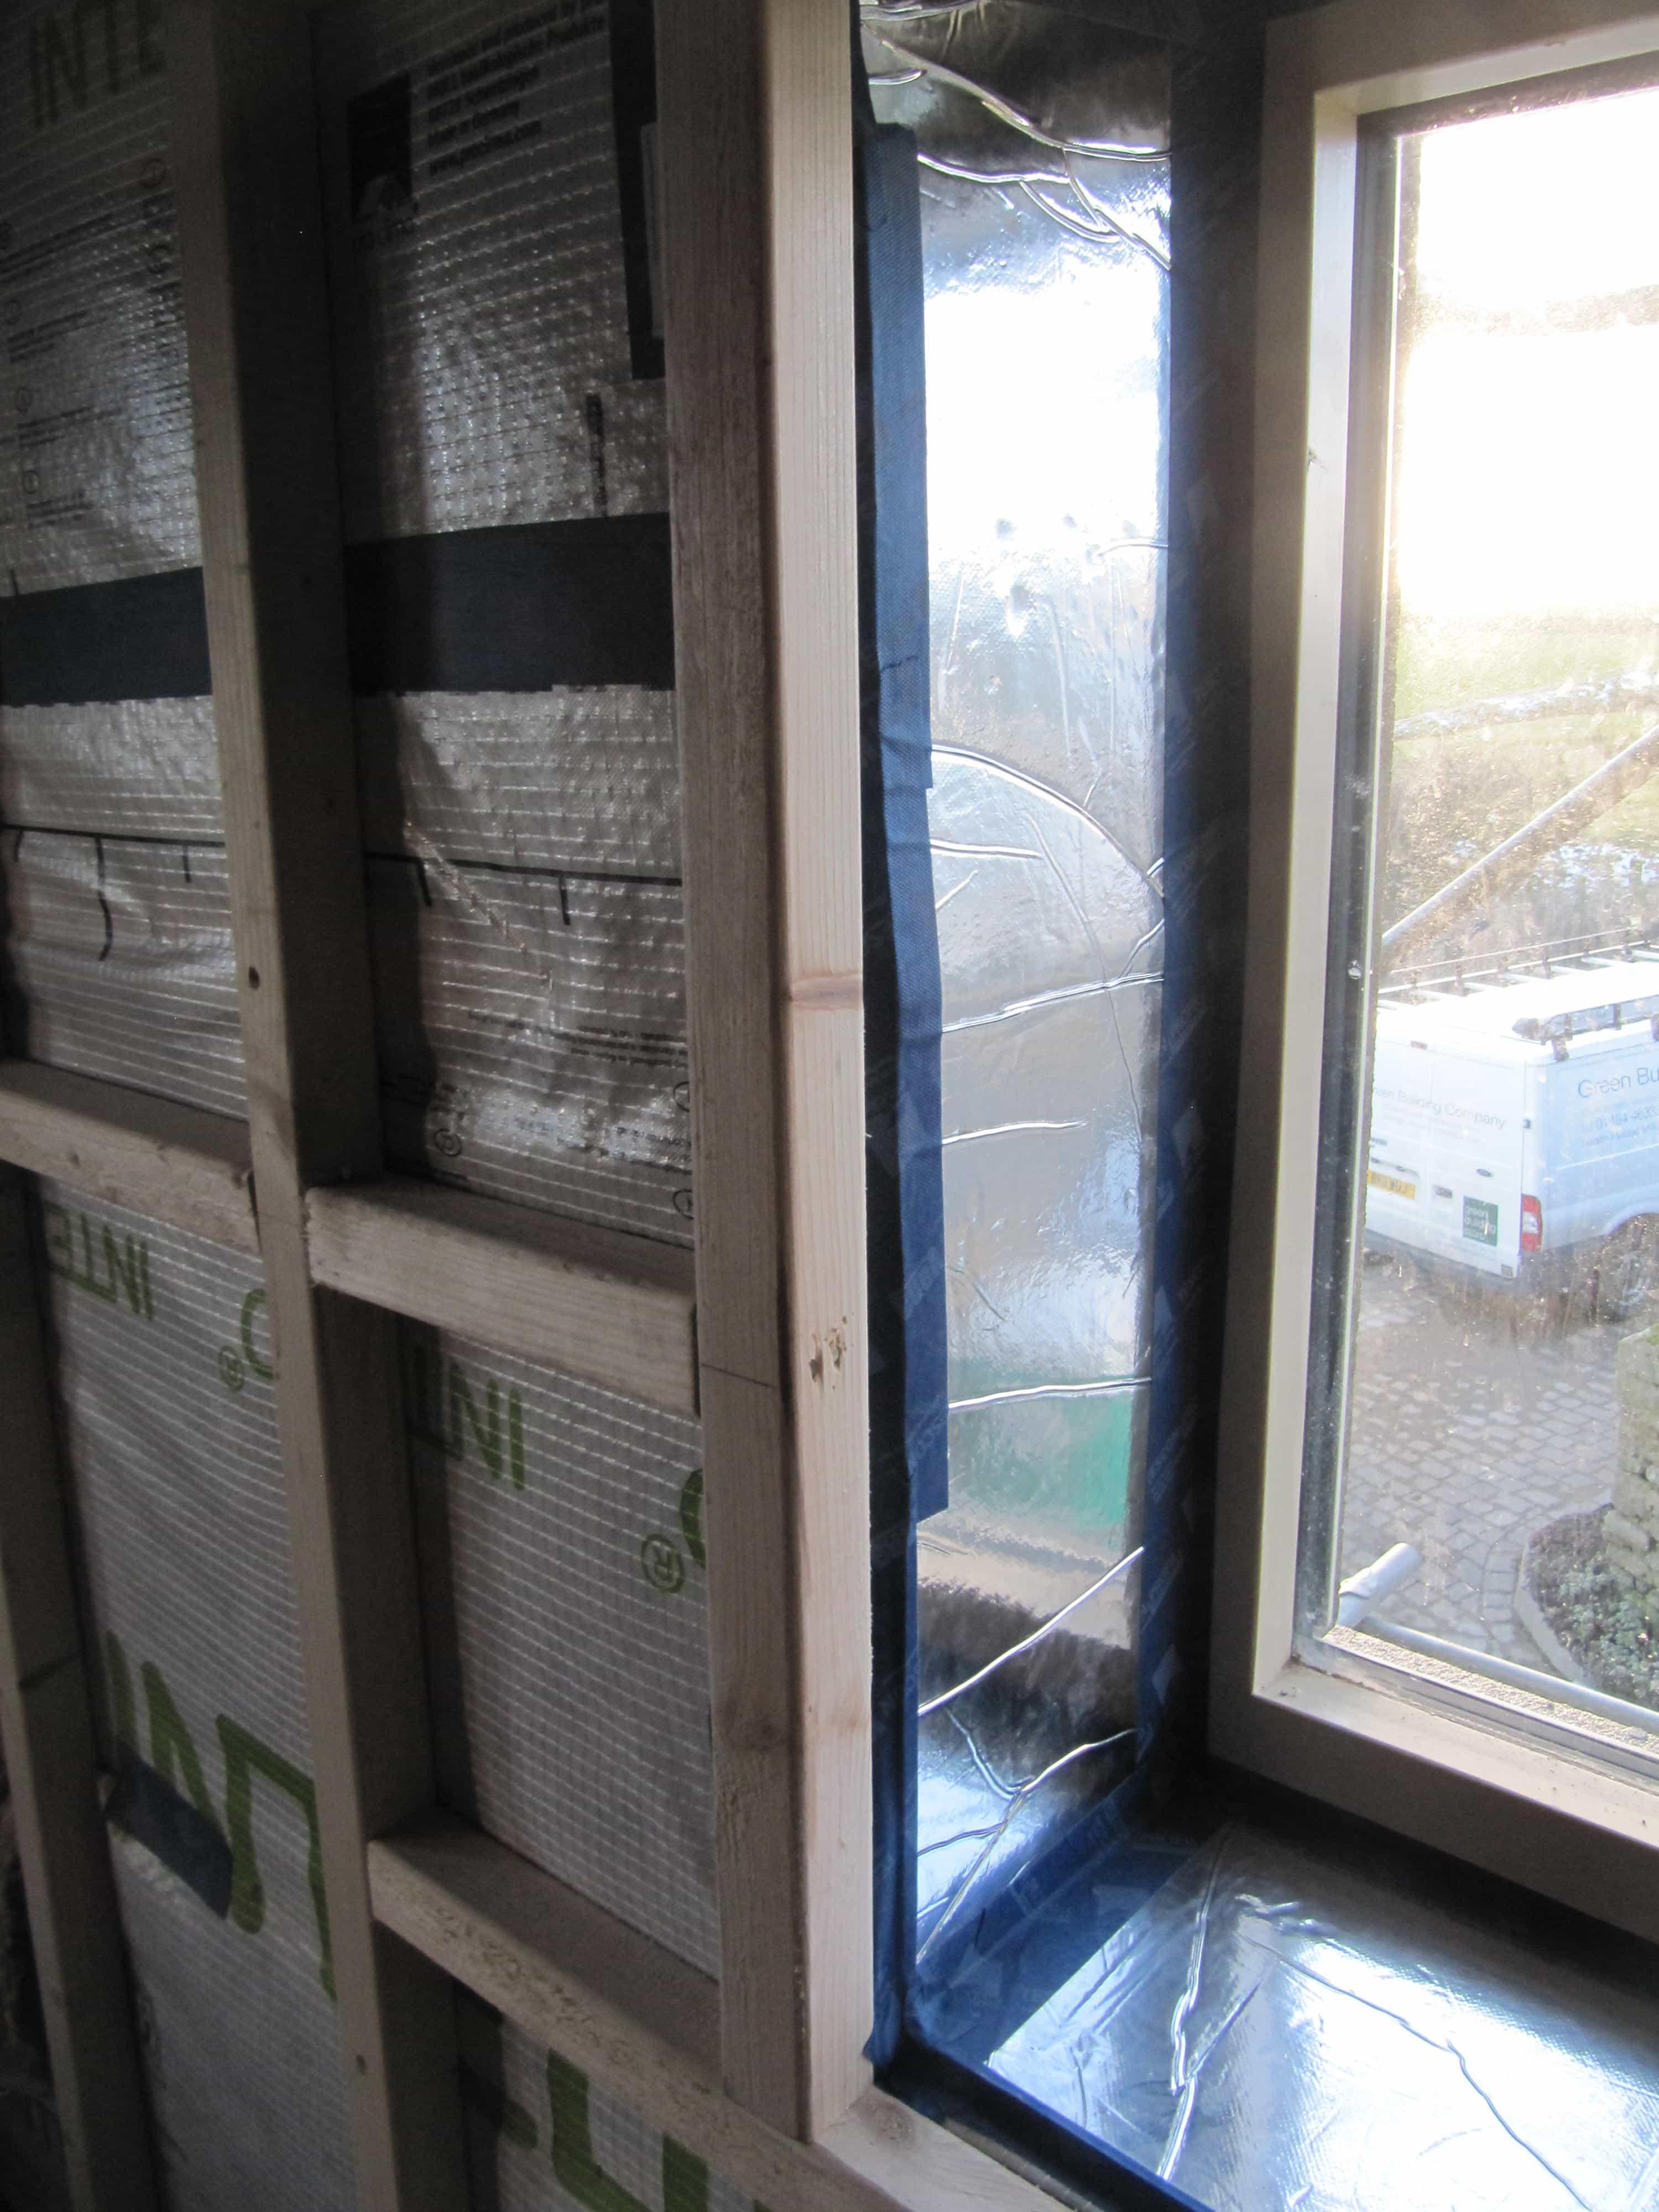 Good Kevoethermal Vacuum Insulated Panels (VIPS) Used At Cumberworth Radical  Retrofit To Reduce Thermal Bridging